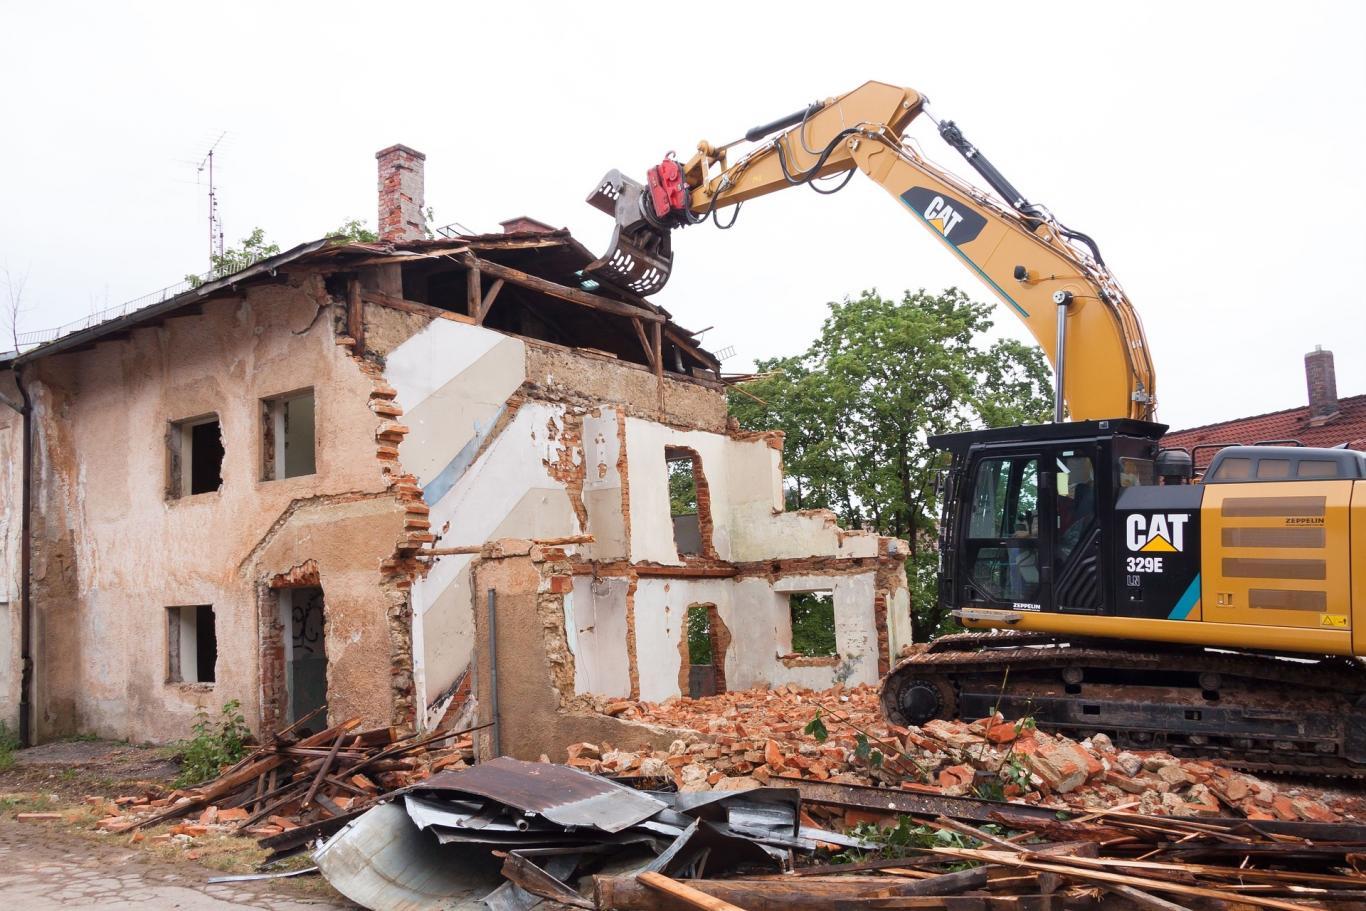 Residuos demolición